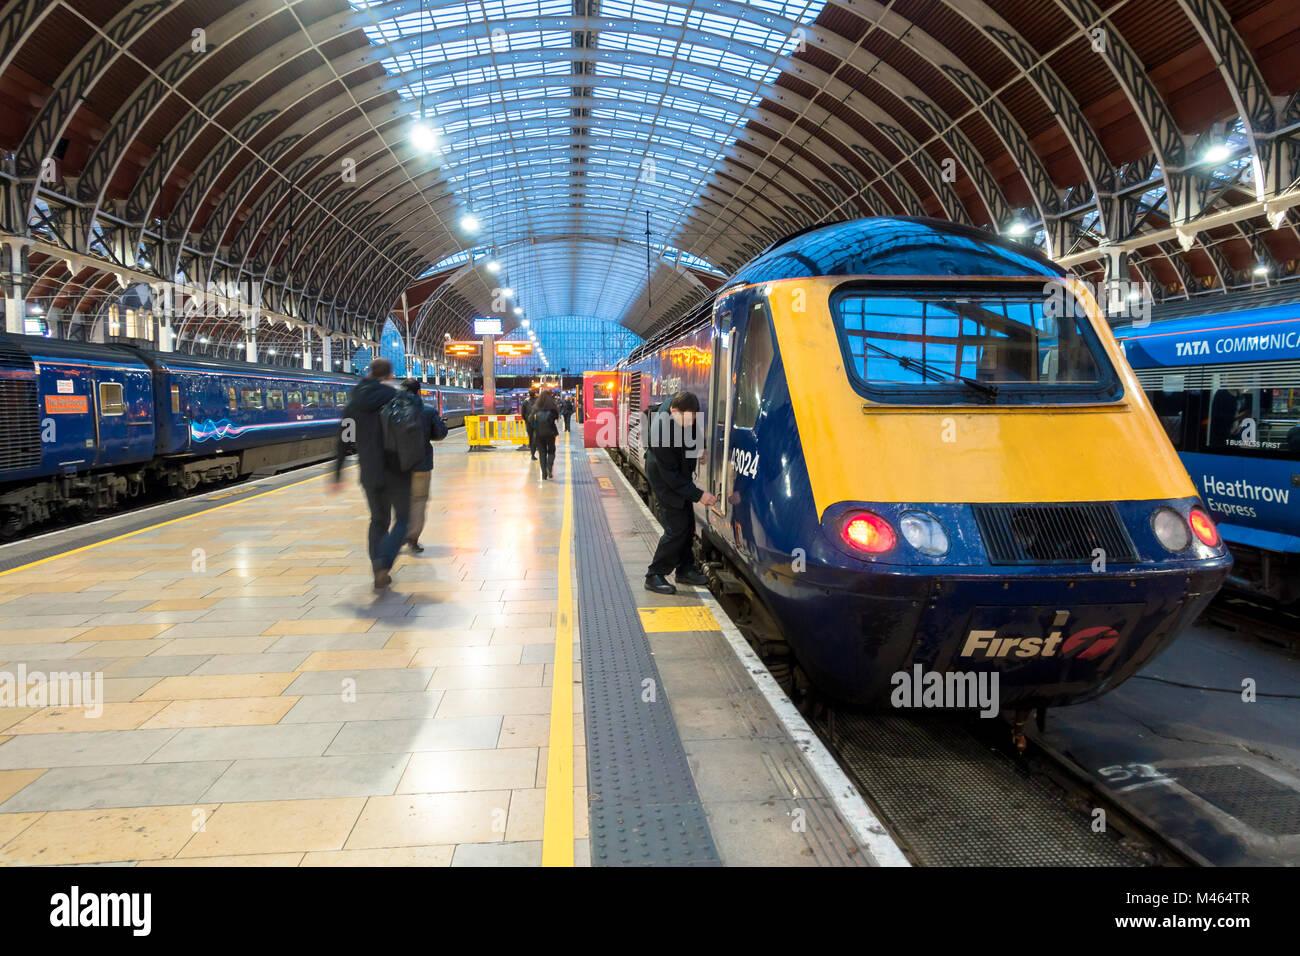 a-train-driver-locks-the-cab-at-one-end-of-an-intercity-125-at-paddington-M464TR.jpg